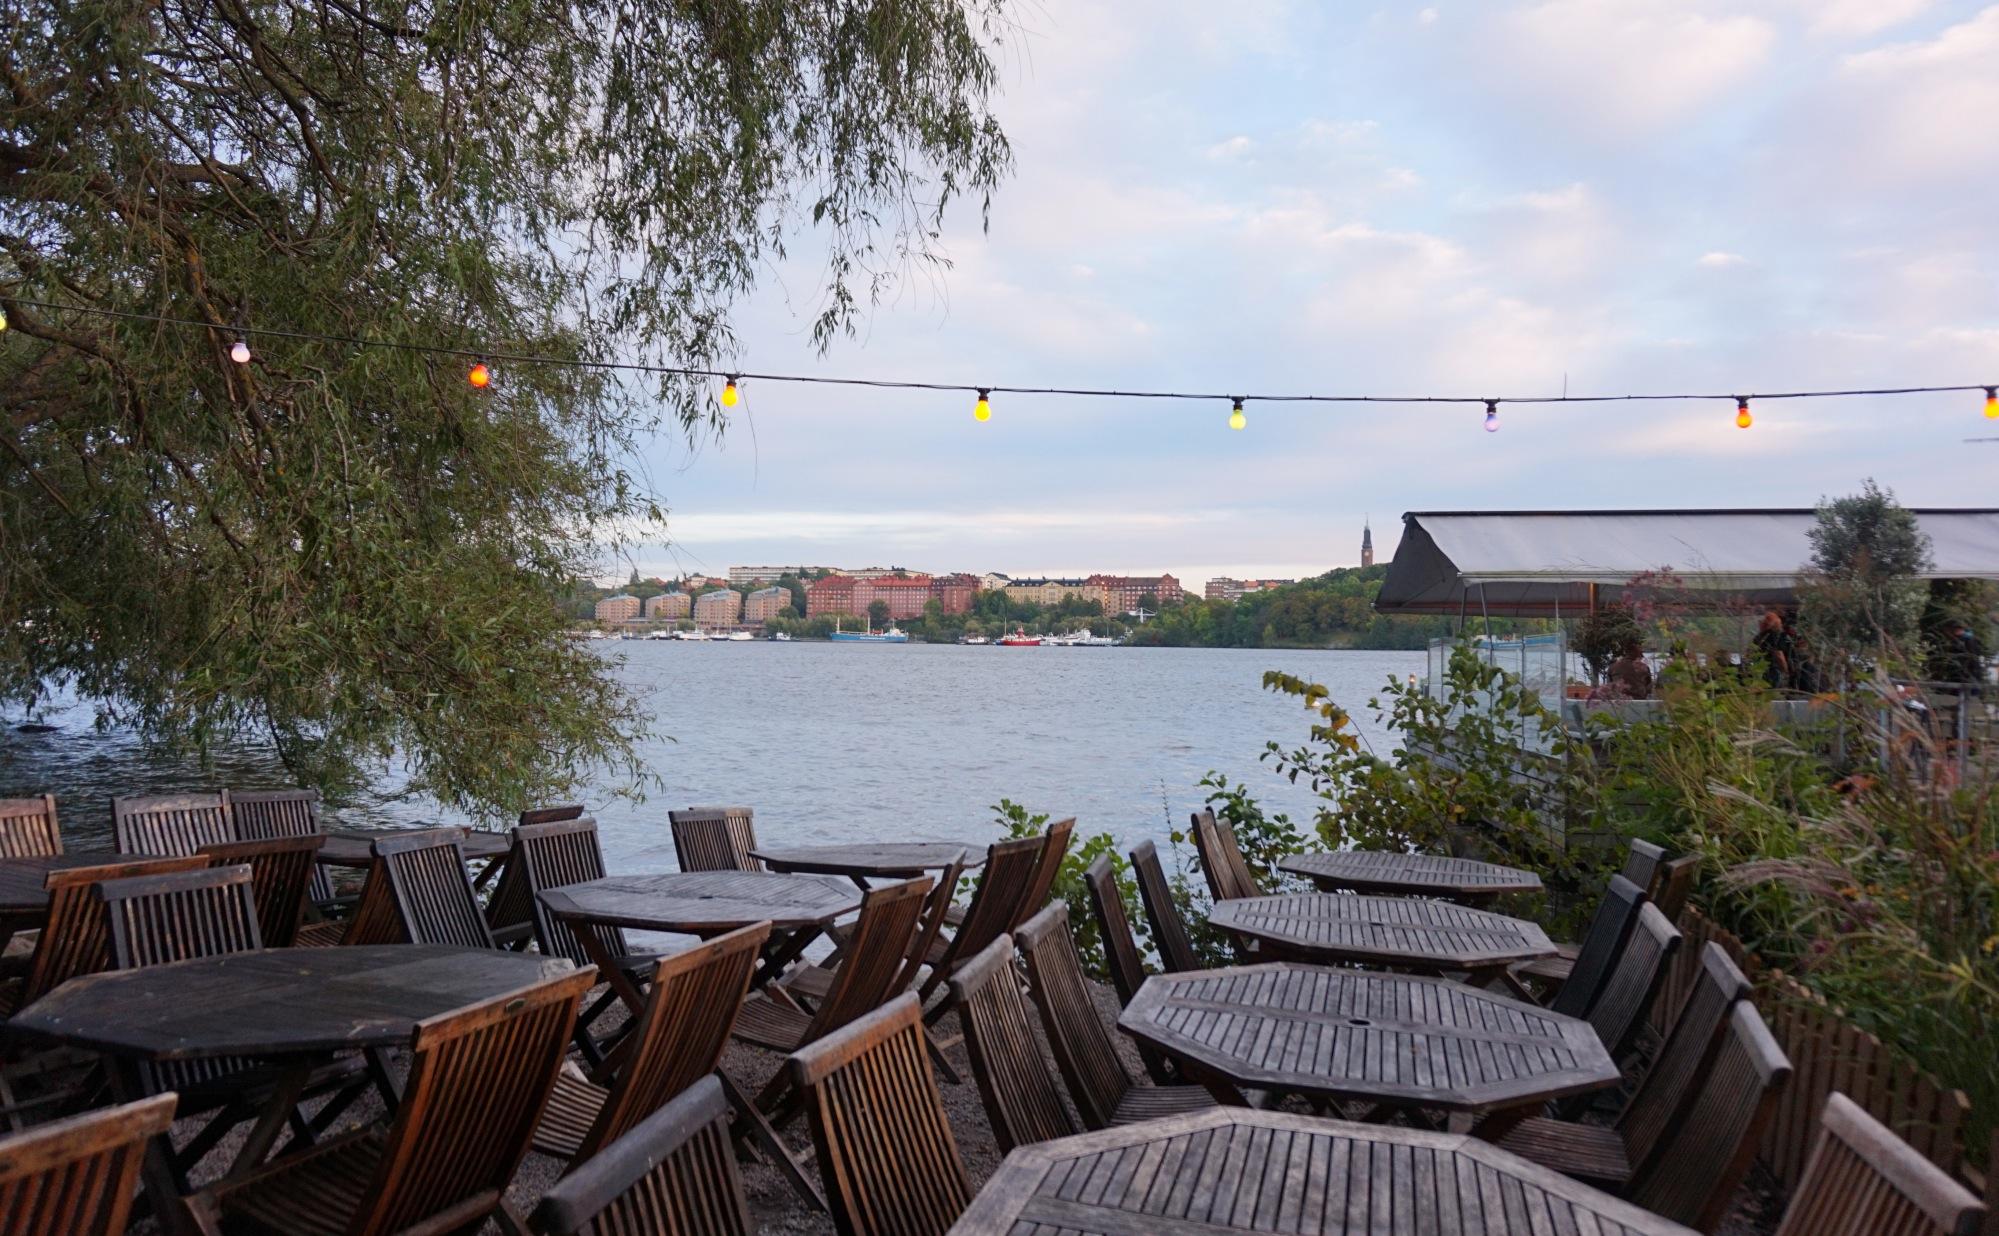 3-jours-a-stockholm-26